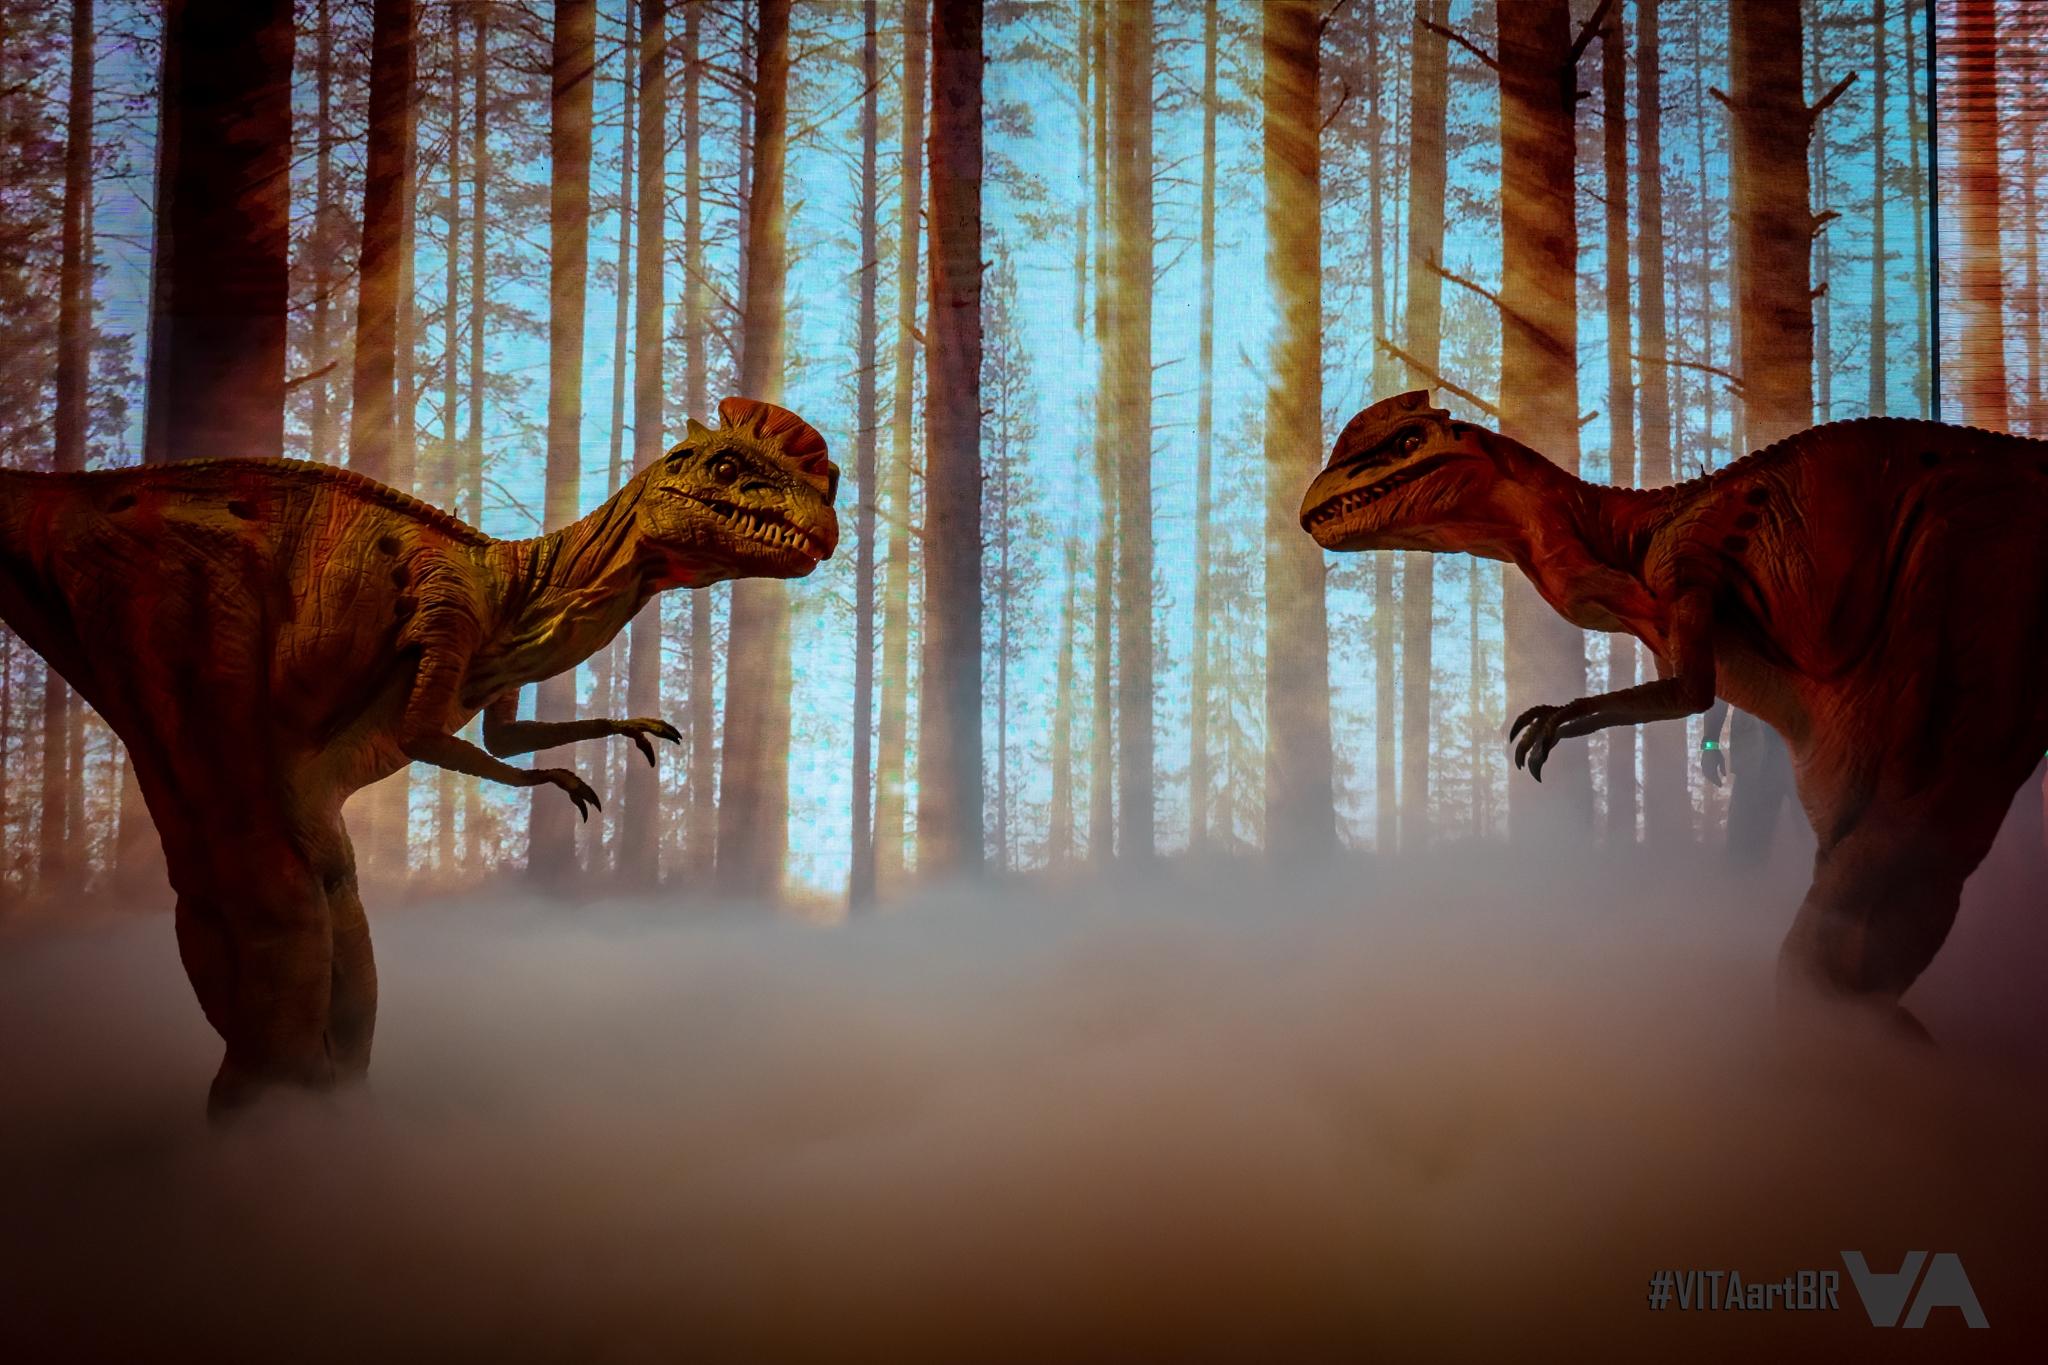 VITAartBR - DinosExperience - 27